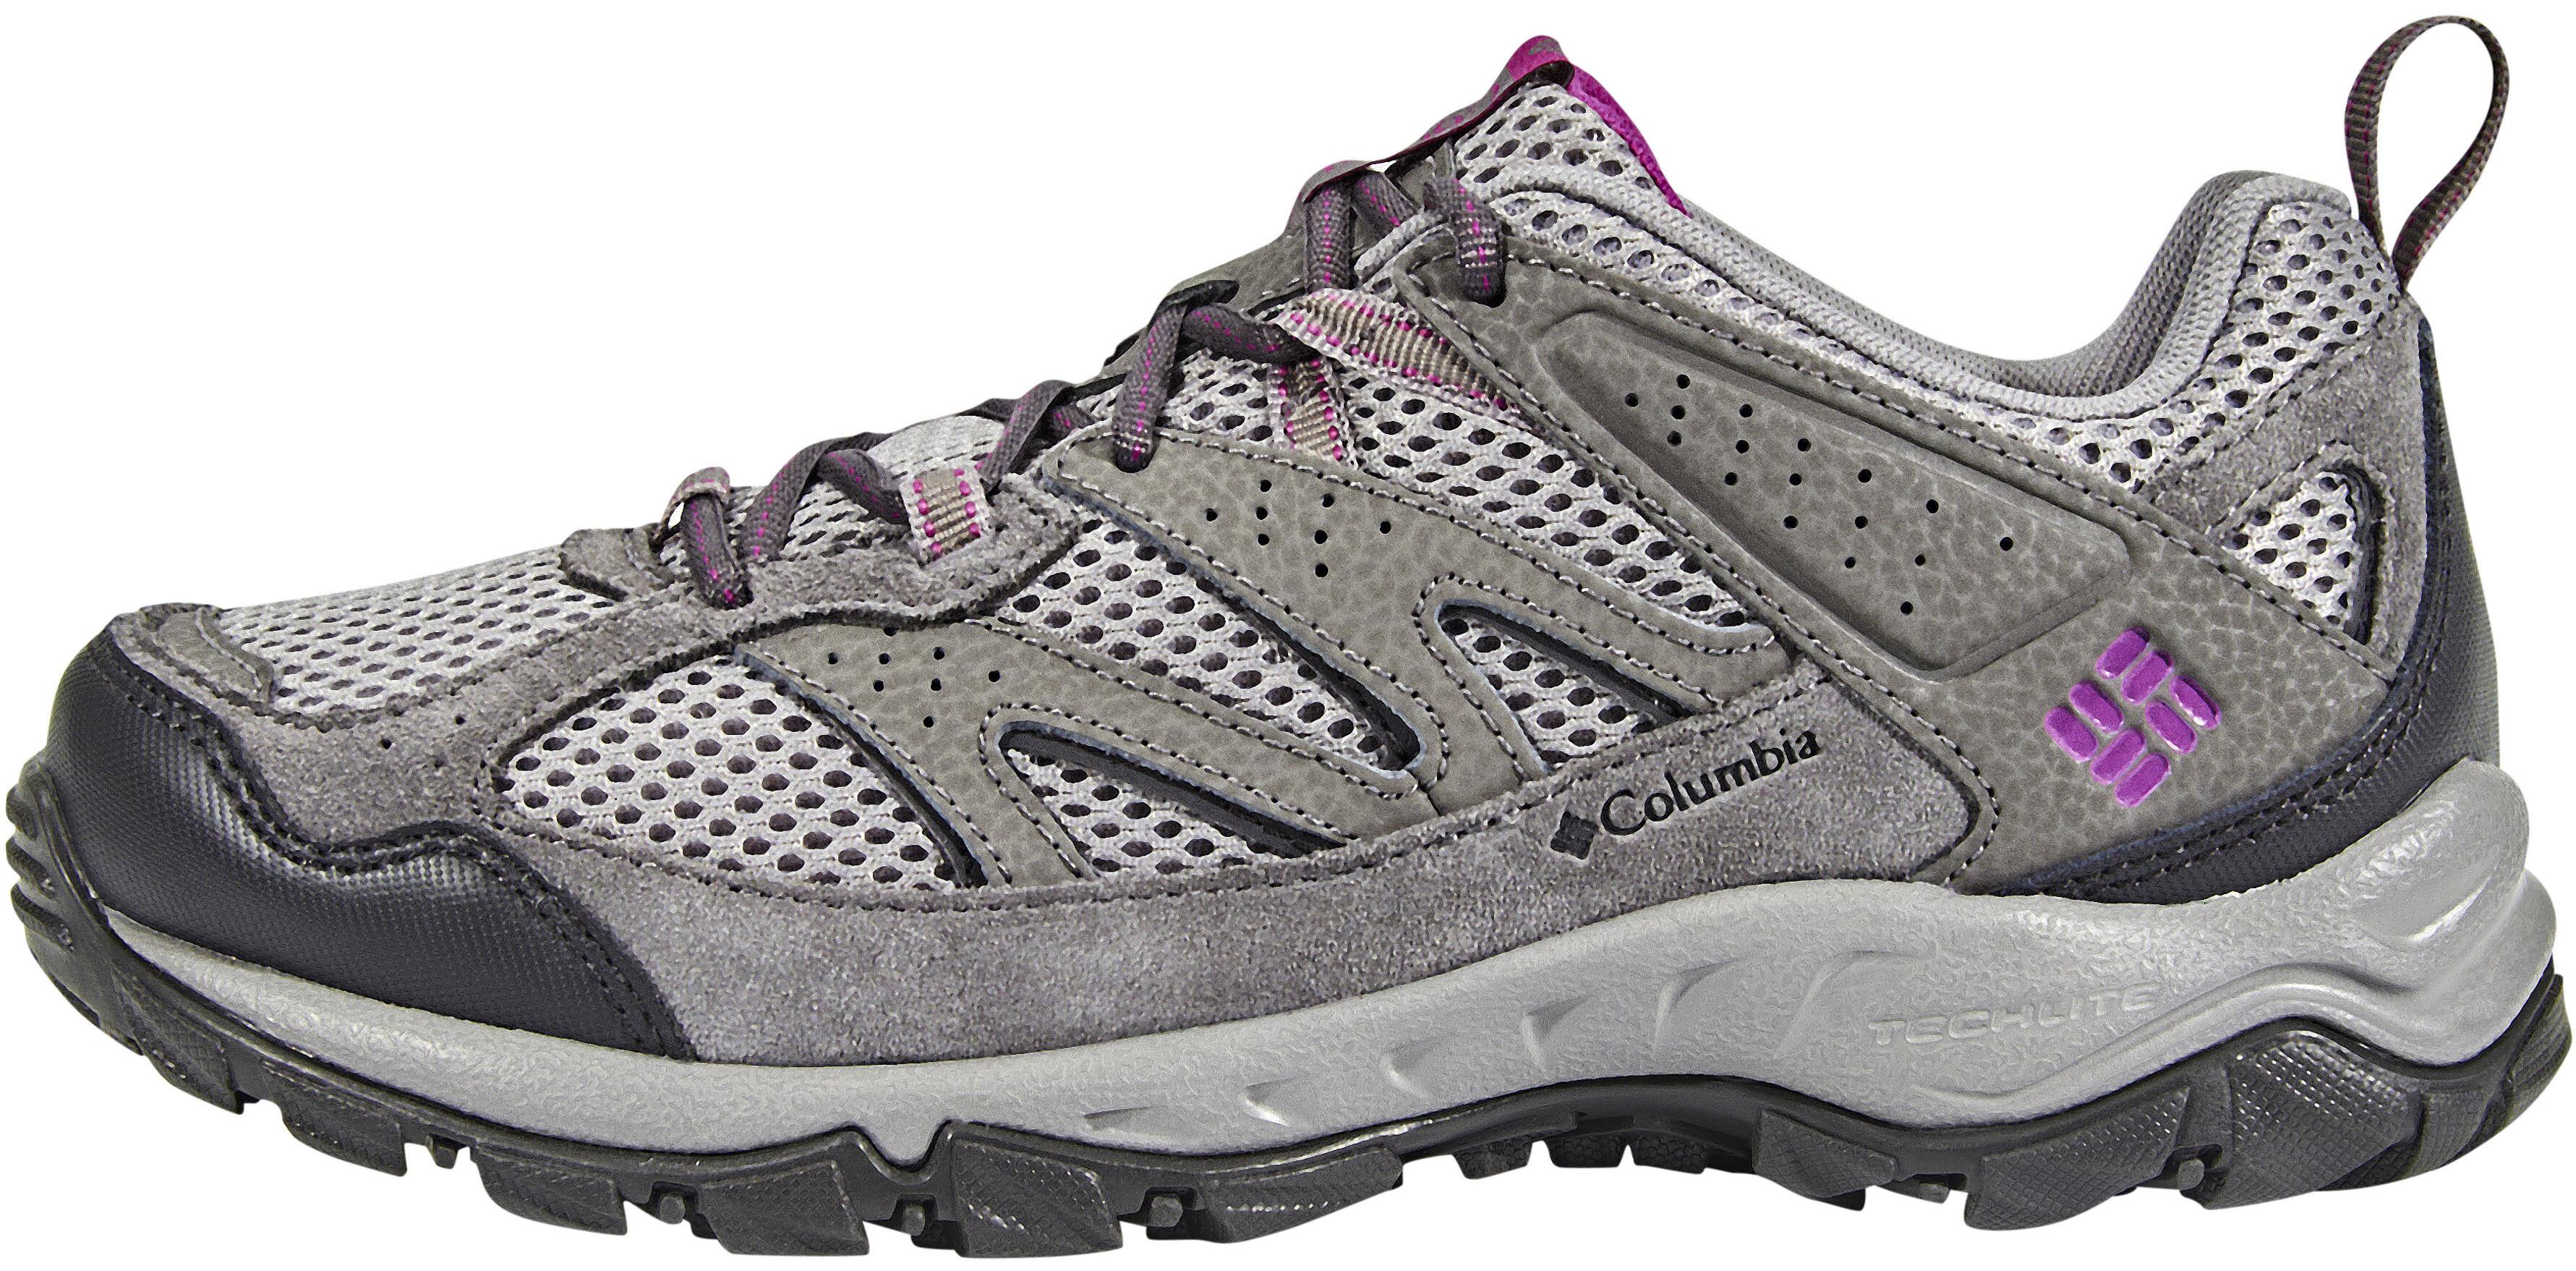 664405ab9fc Columbia Plains Ridge Sko Damer grå | Find outdoortøj, sko & udstyr ...